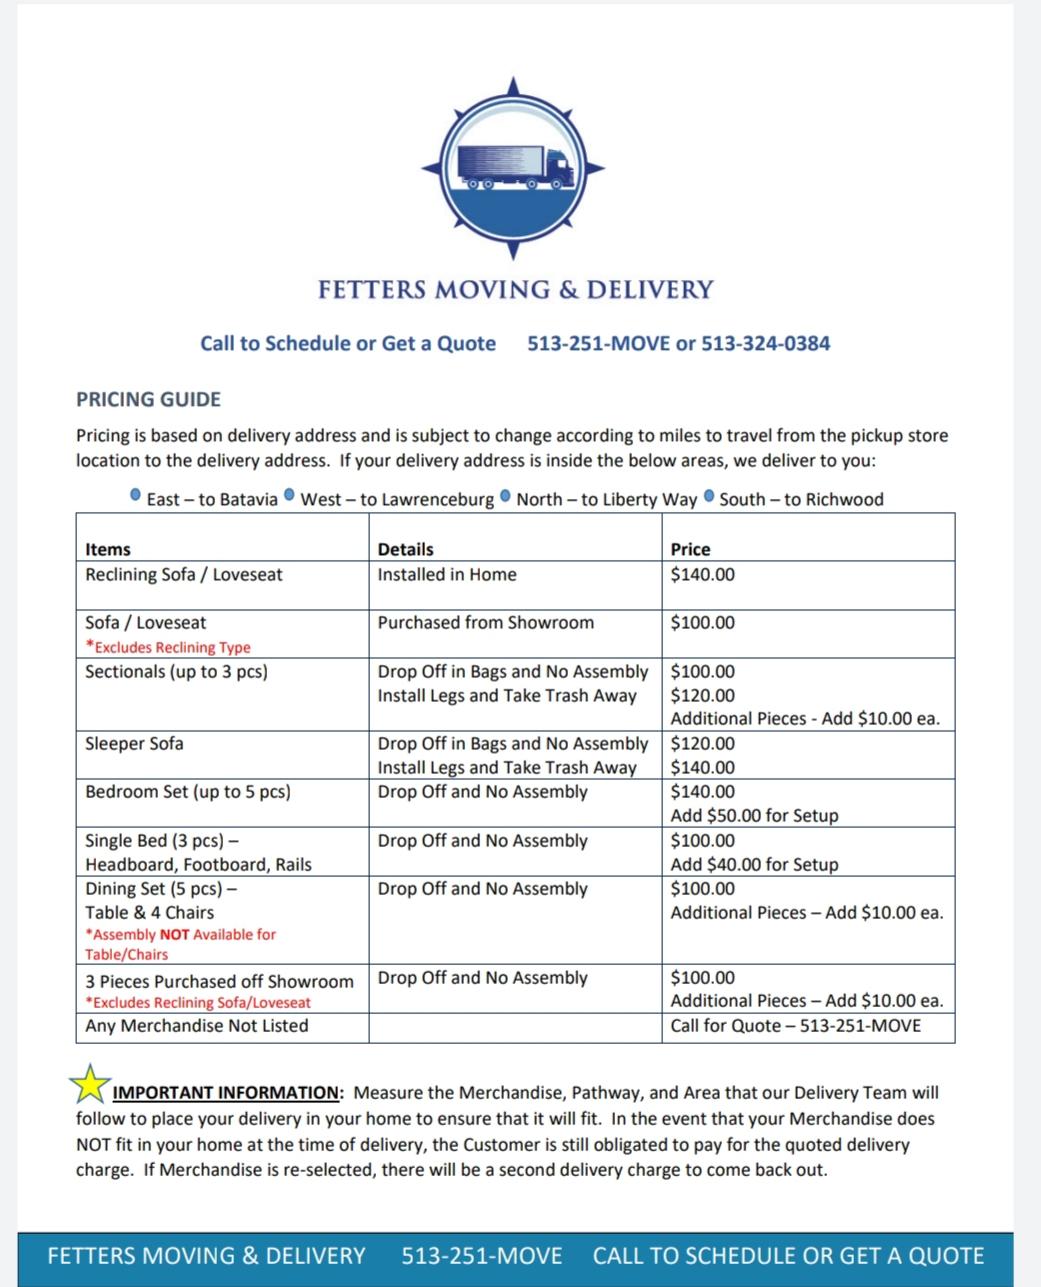 jodie-fetters-moving-sheet-sept-2020.jpg